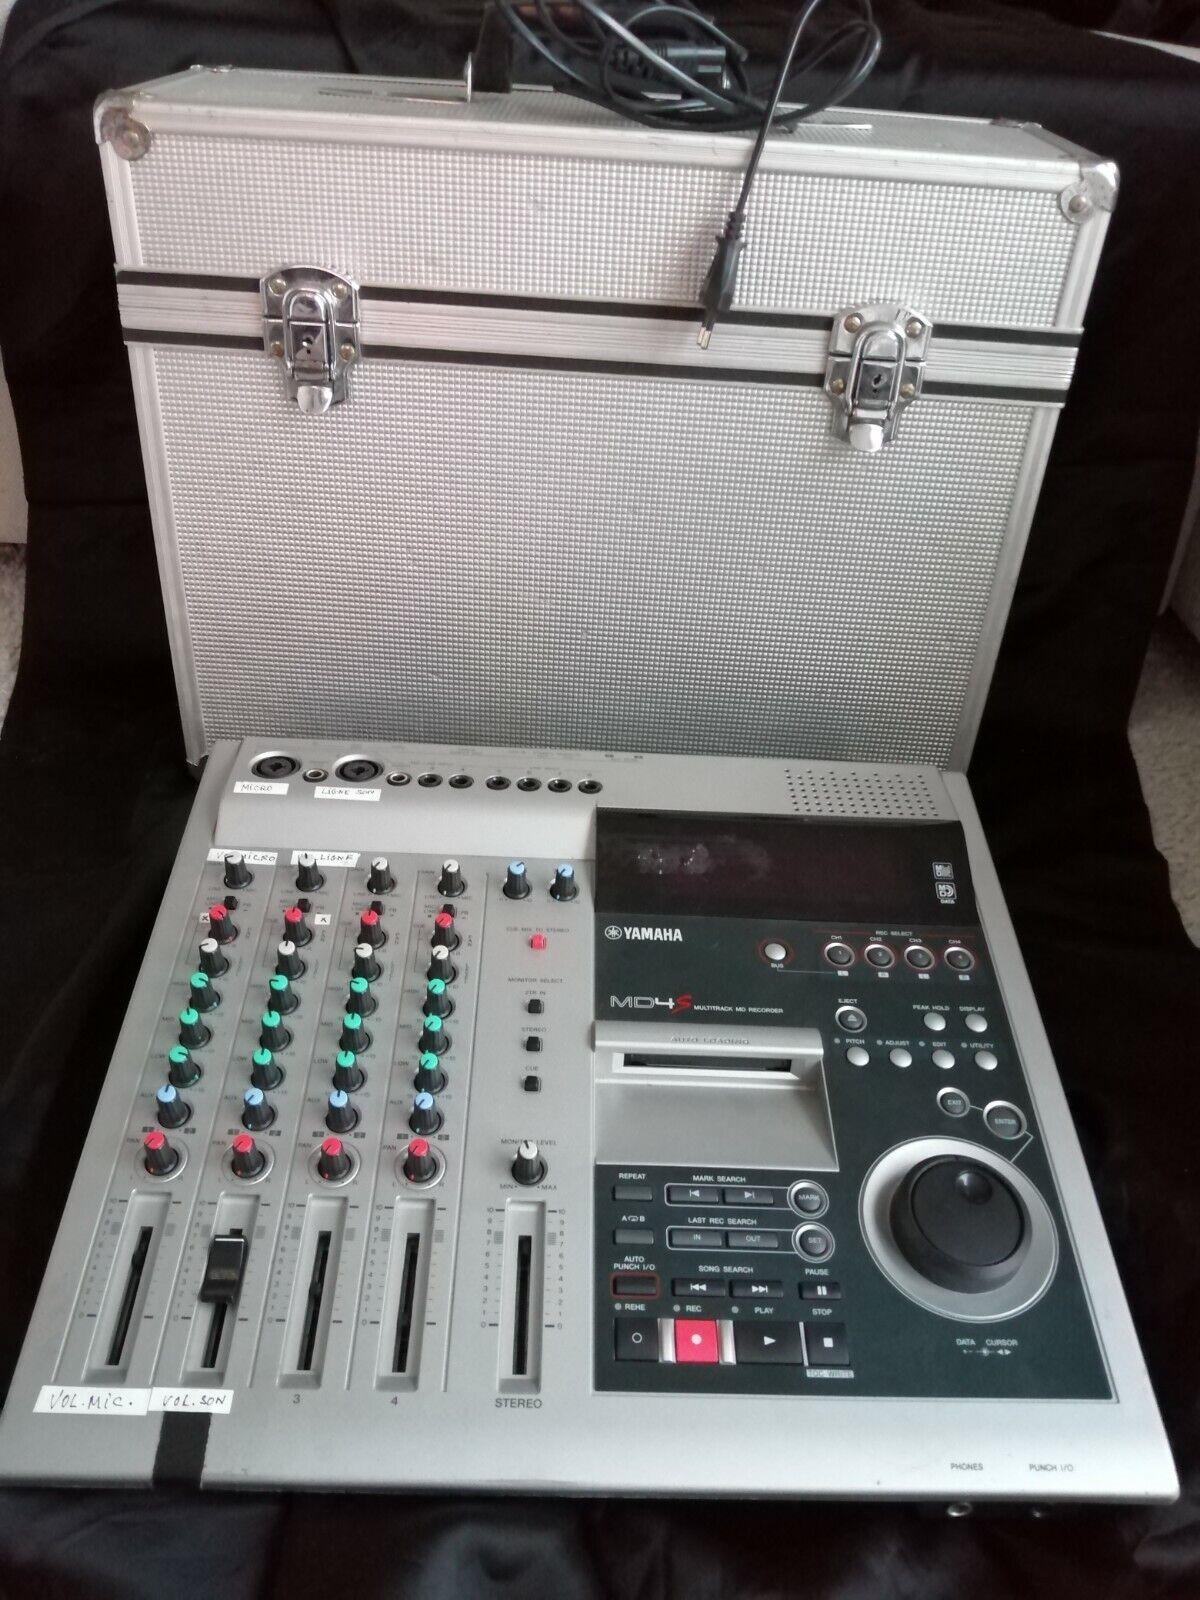 Table de mixage yamaha md4s